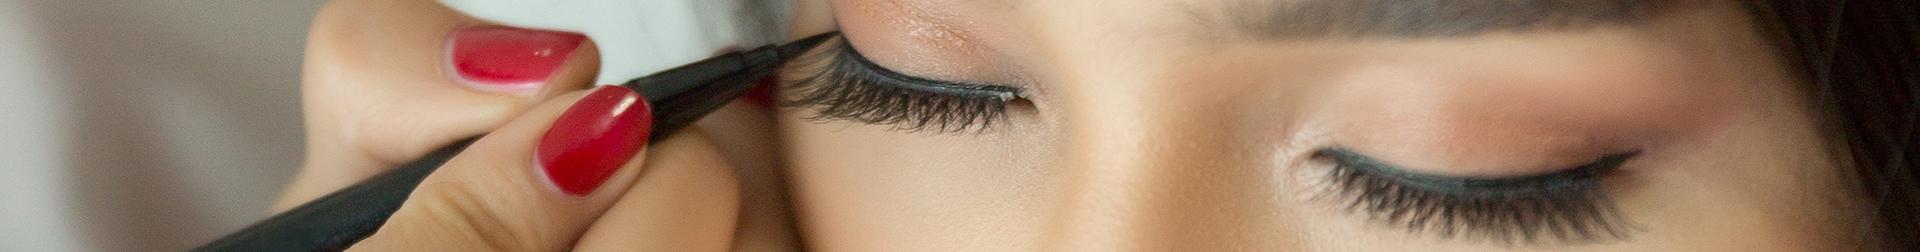 Makeup Products   Eyeliner- Buy Eyeliner Products   AromaCraze